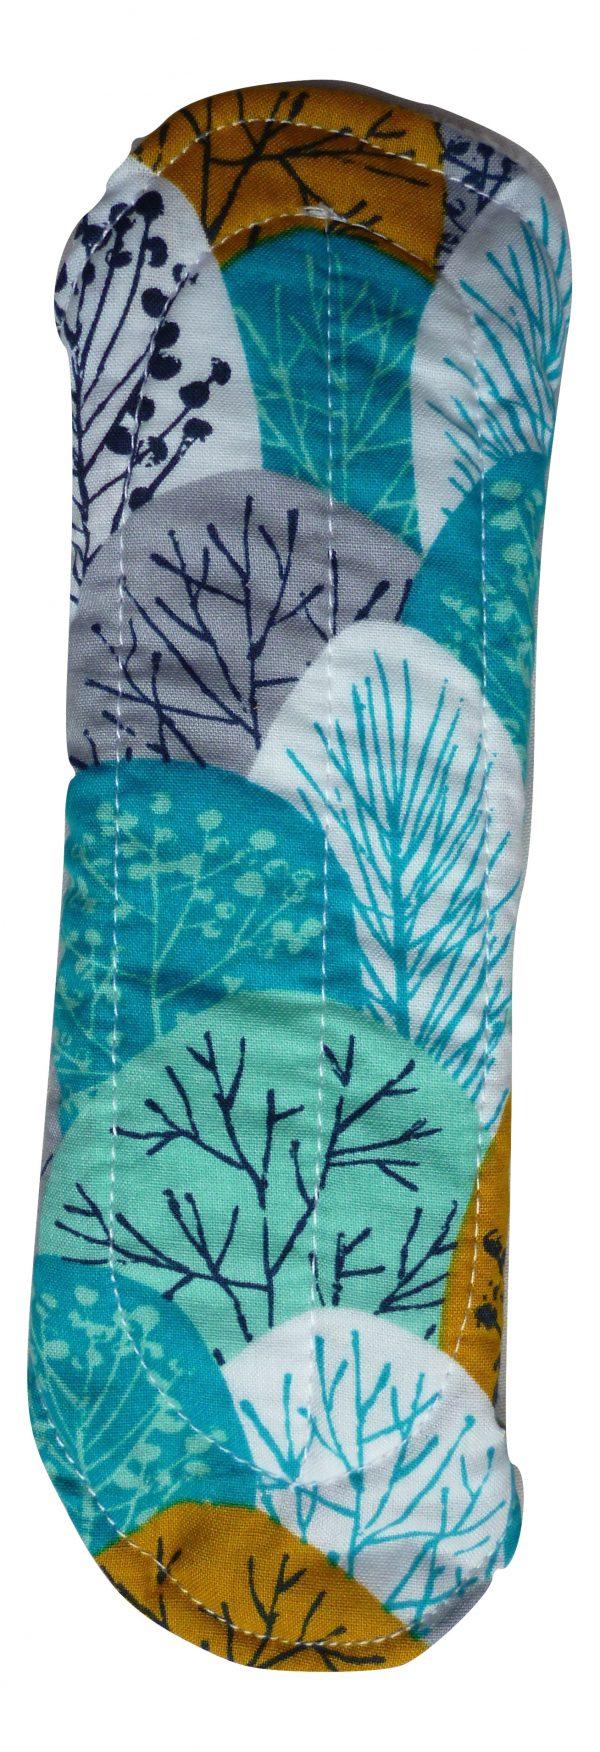 Angelpadz Spring Woodland Turquoise Organic Cotton Regular Pad -PUL